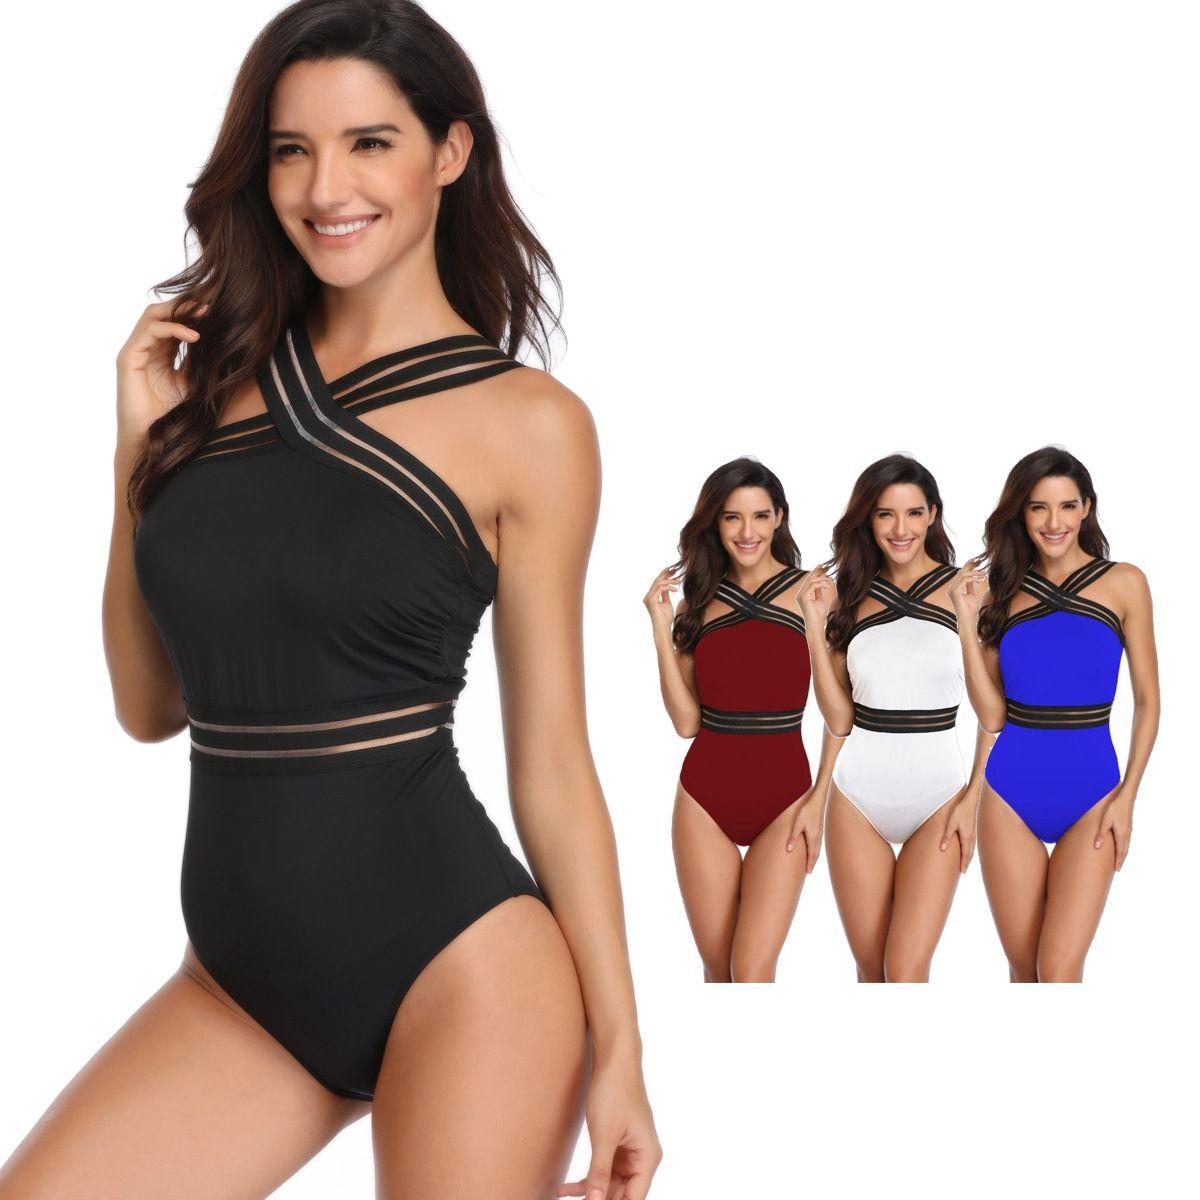 Womens One Piece Suits Backless Swimsuits Tummy Control Sexy Swimwear Bikinis Athletic Training Slimming Bathing Swim Wear Mma1876